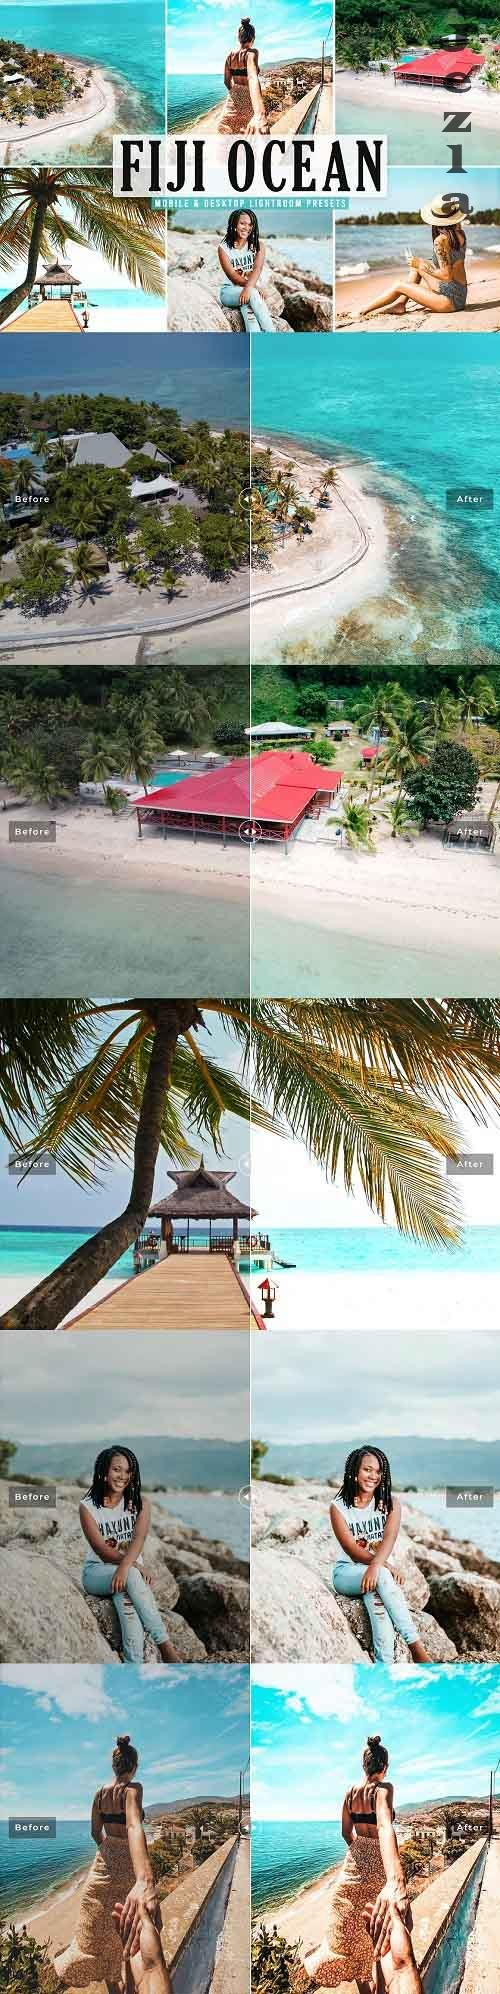 Fiji Ocean Pro Lightroom Presets - 5542413 - Mobile & Desktop